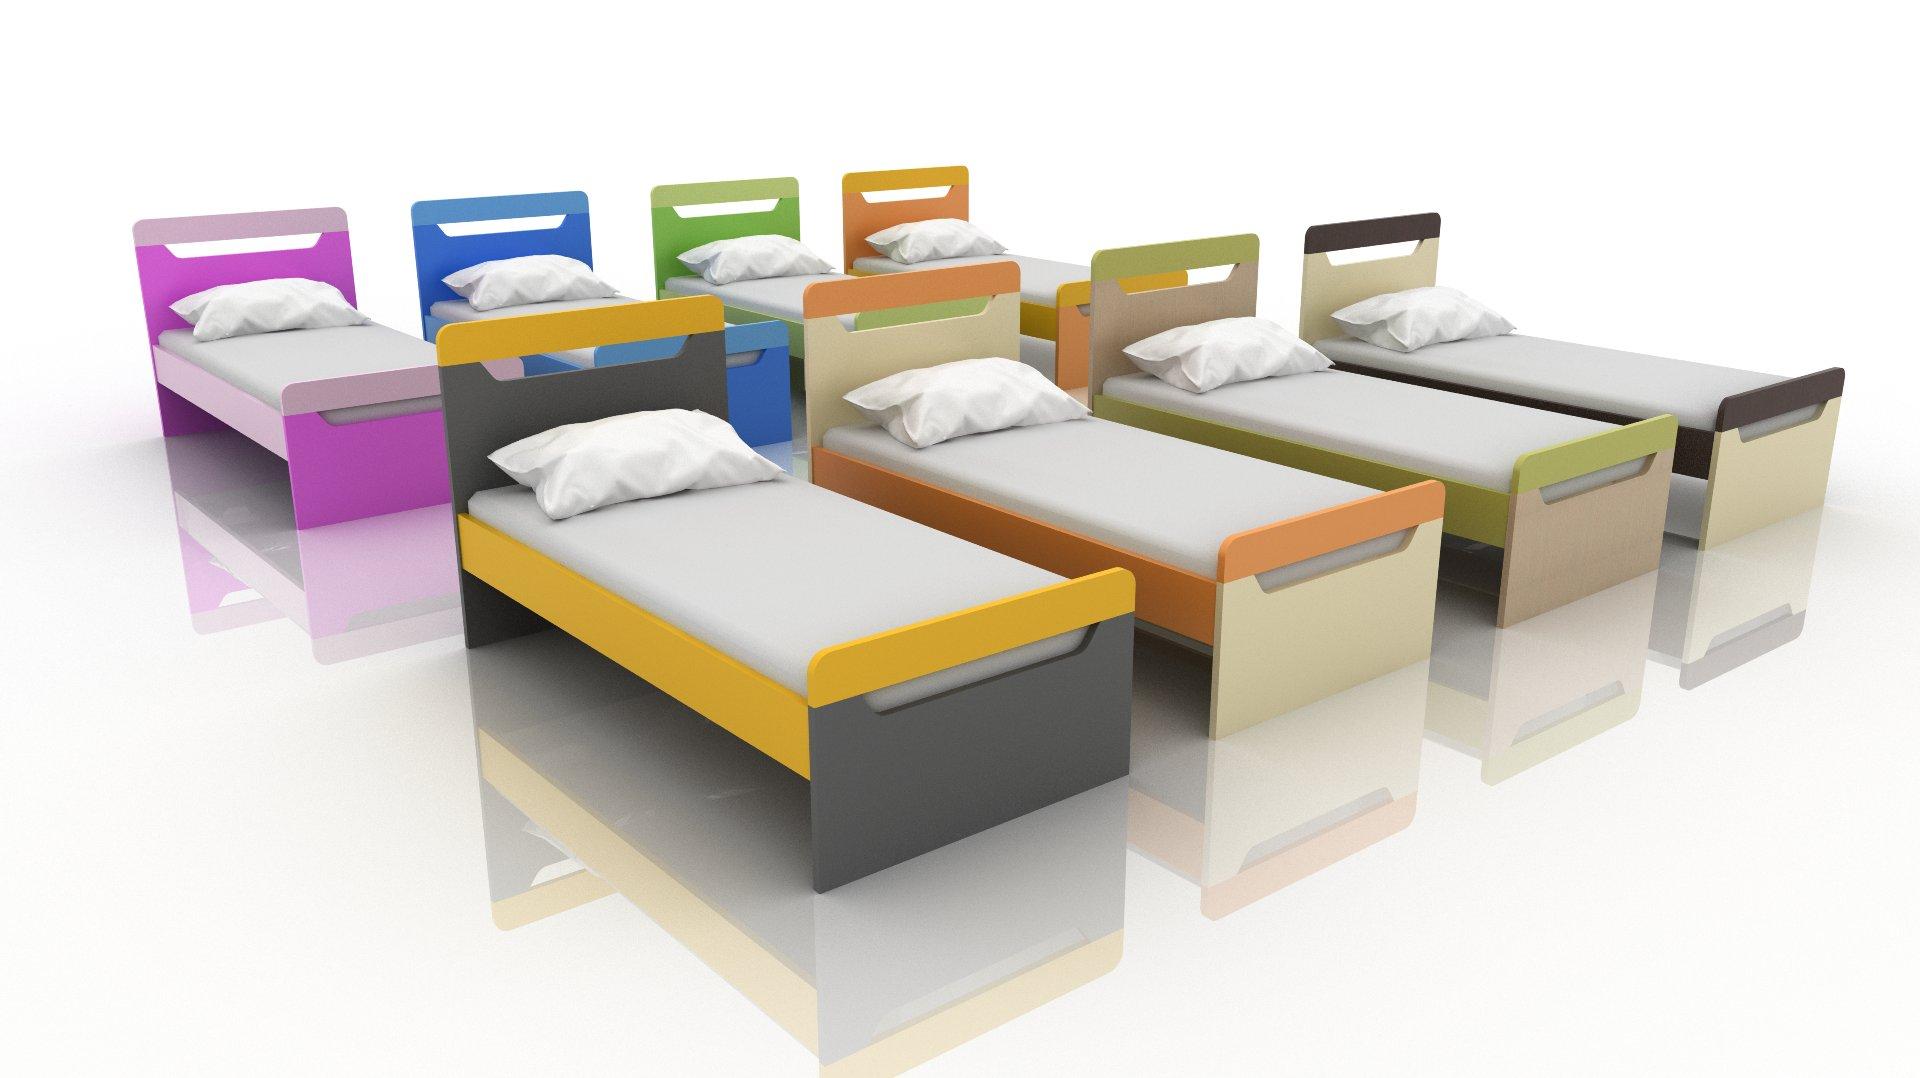 a95343022 Παιδικό Κρεβάτι